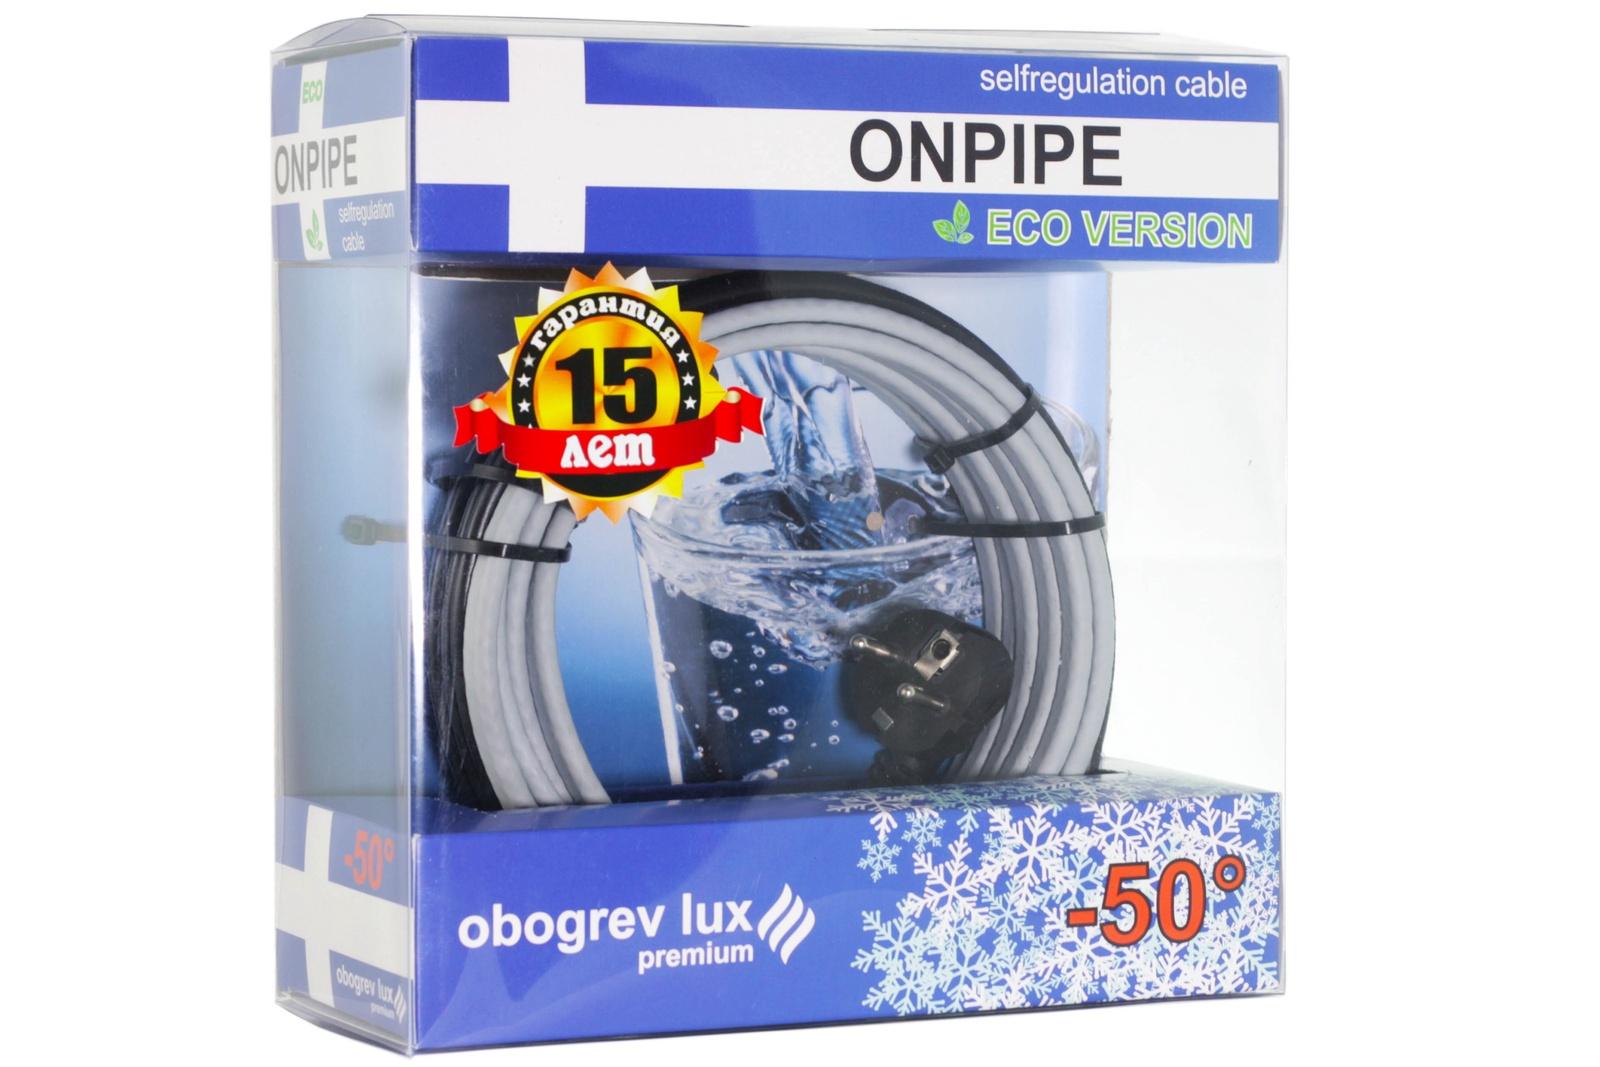 Греющий кабель Обогрев Люкс ONPIPE OL Premium 15м на трубу саморегулирующийся